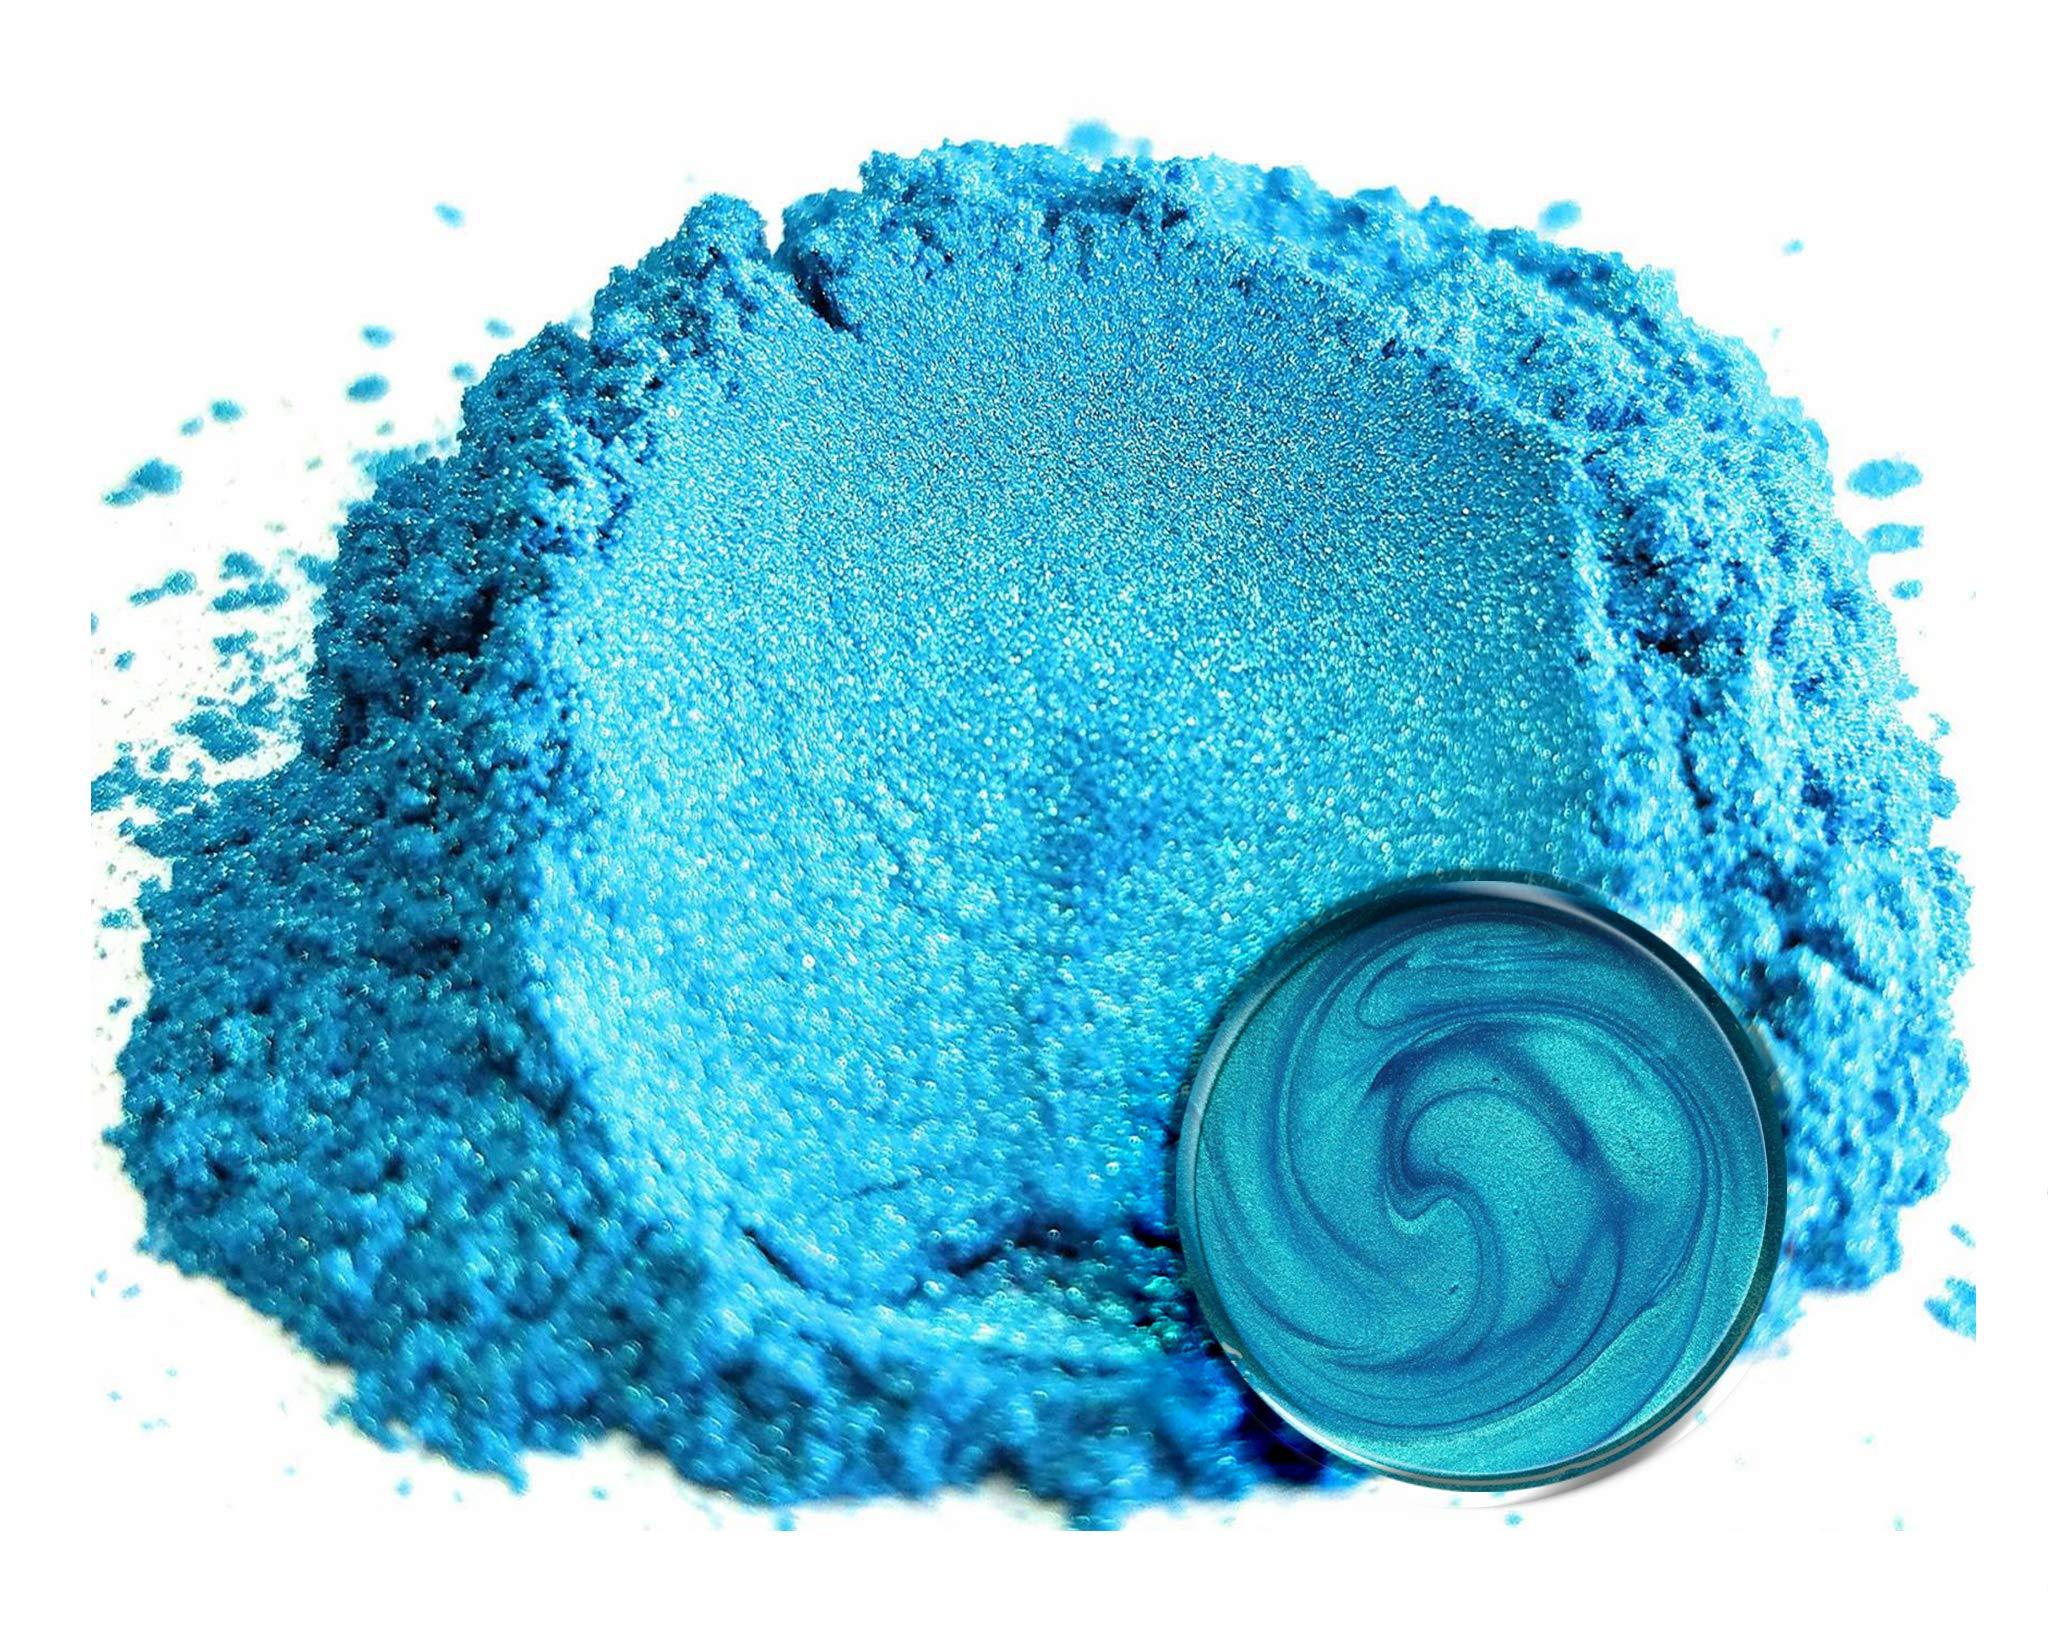 Eye Candy Mica Powder Pigment ''Okinawa Blue'' (50g) Multipurpose DIY Arts and Crafts Additive | Natural Bath Bombs, Resin, Paint, Epoxy, Soap, Nail Polish, Lip Balm